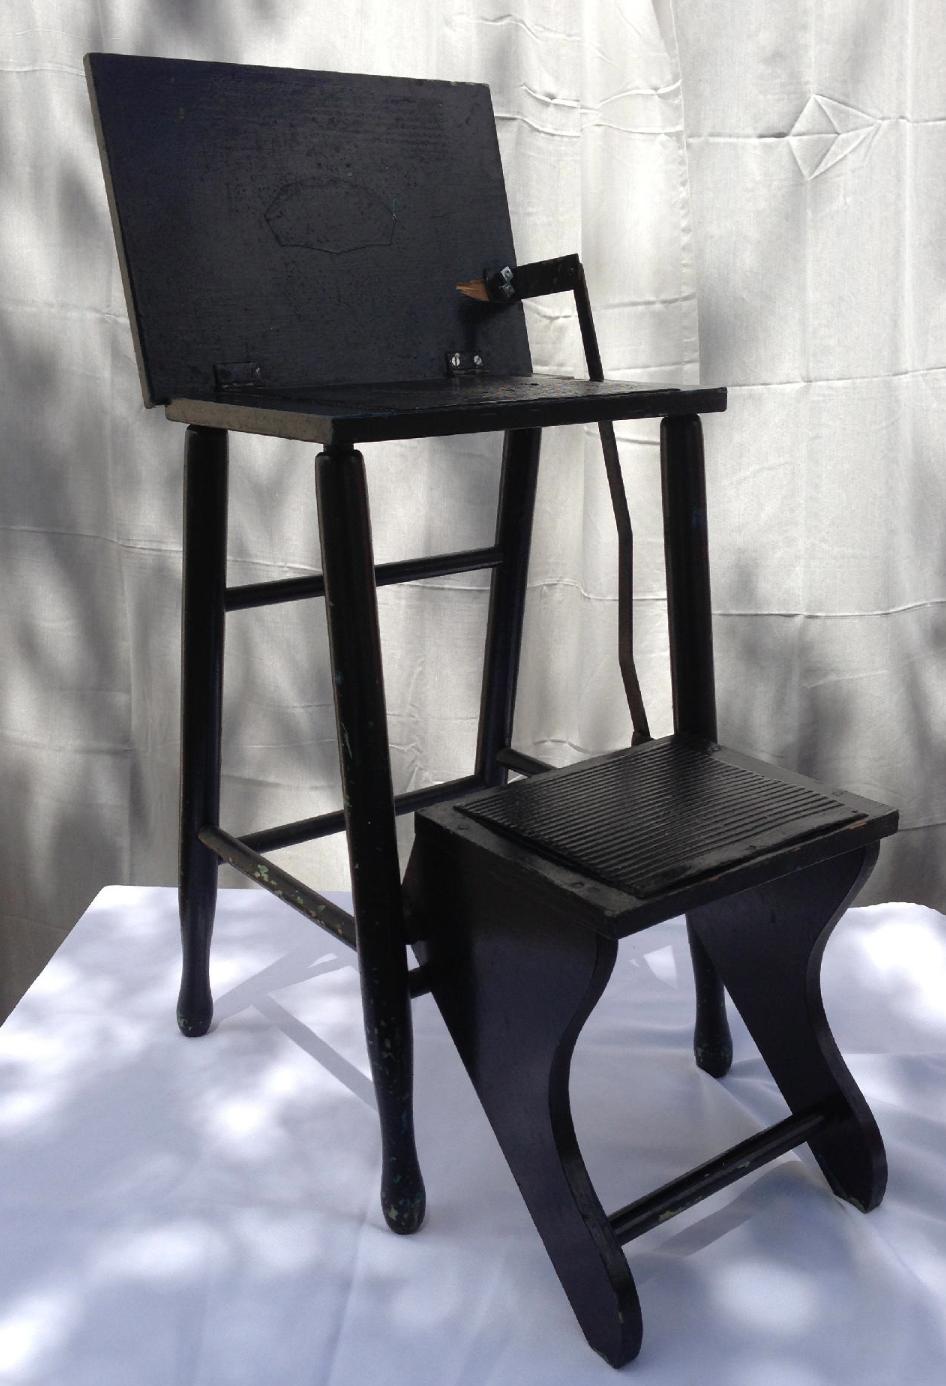 1930's folding step stool